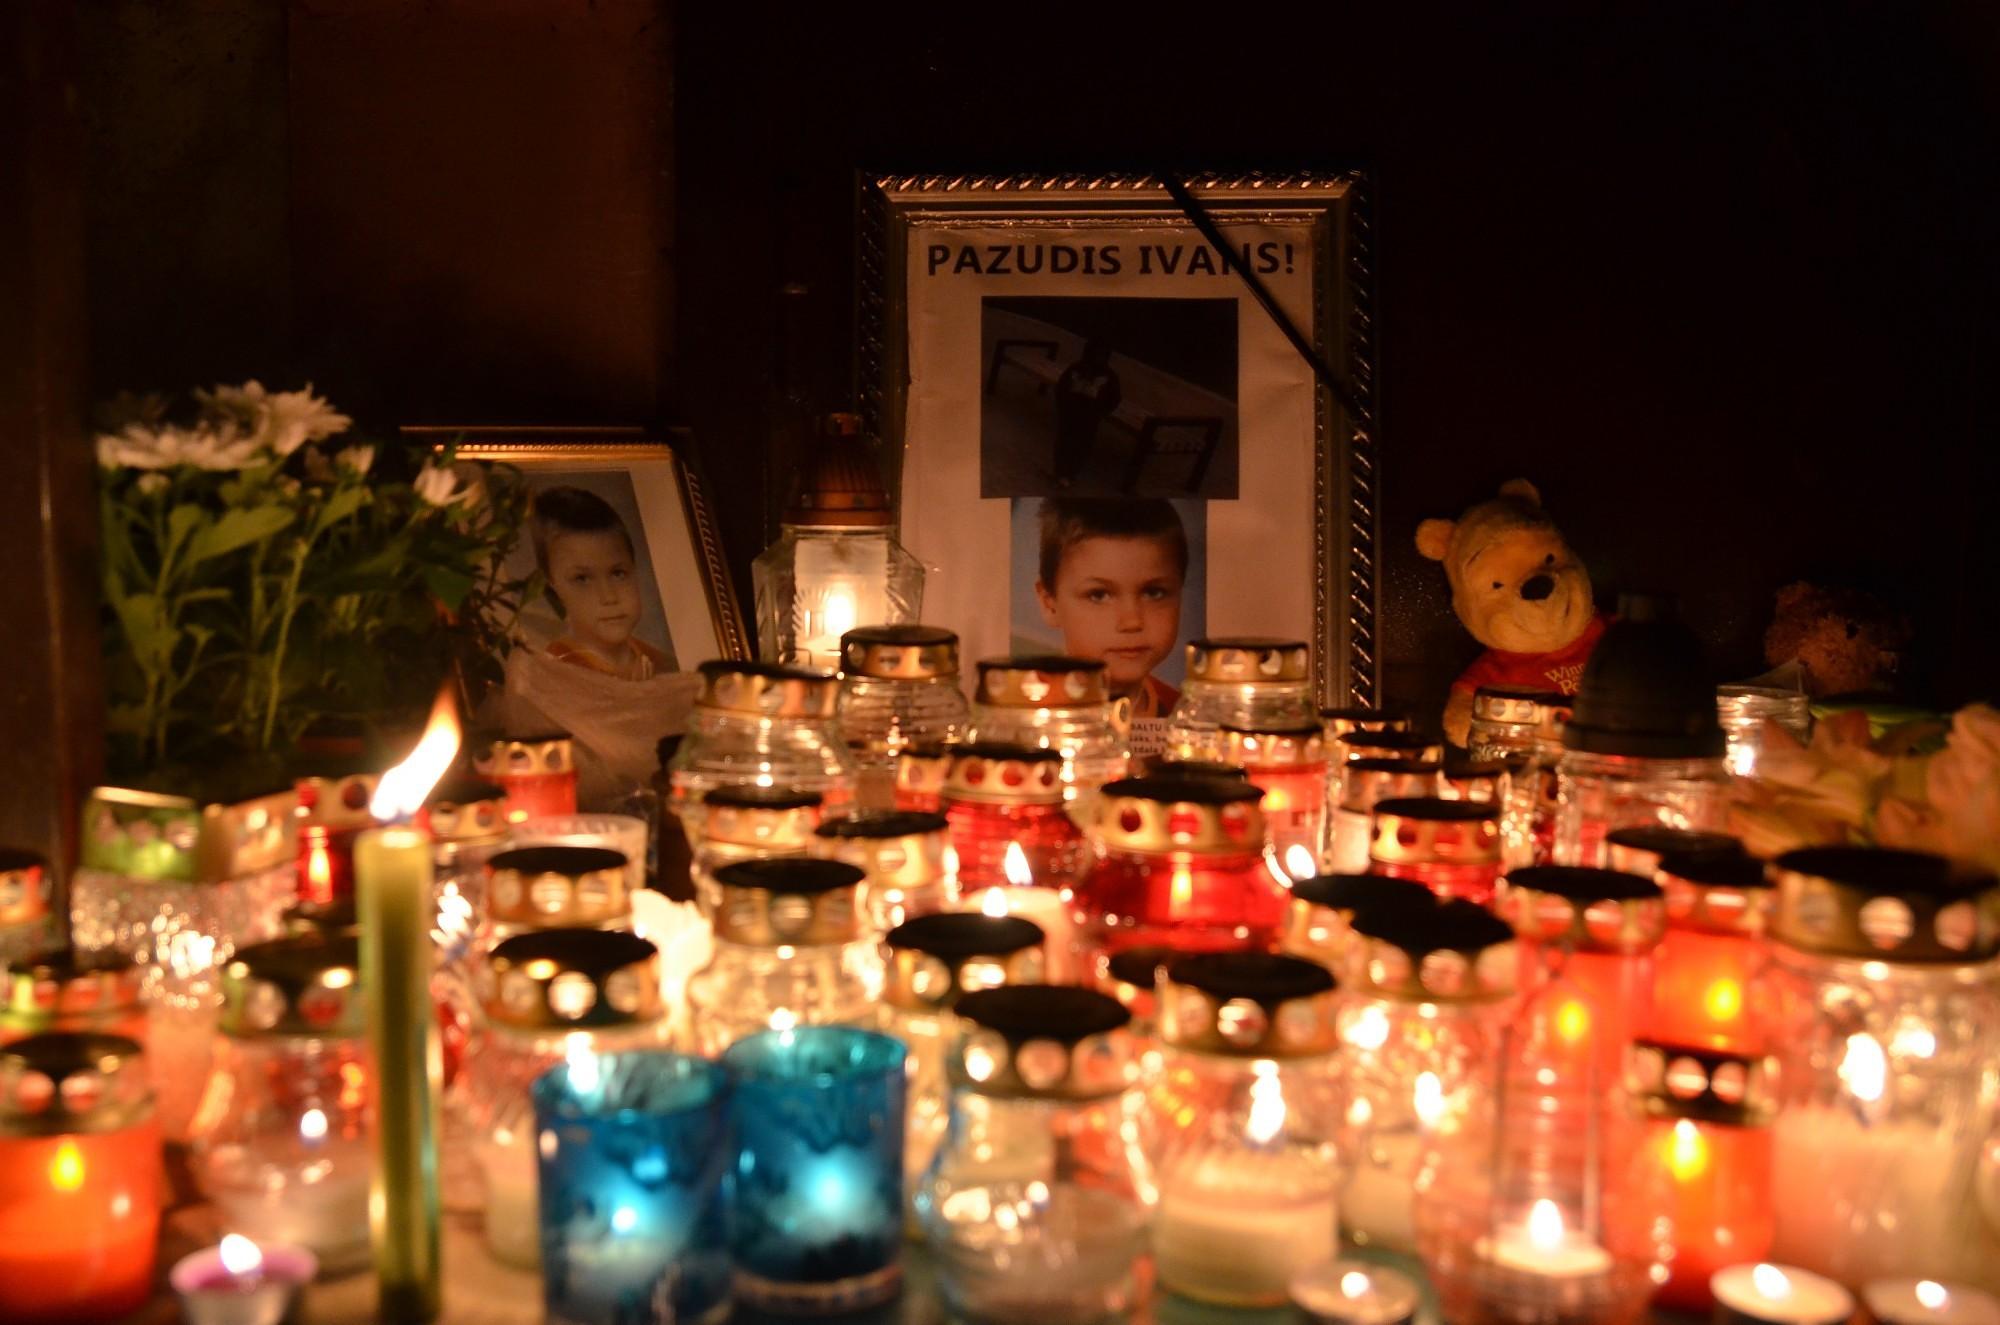 Дело Вани Берладина: уволена сотрудница полиции, начато следствие в отношении родителей и водителя автобуса